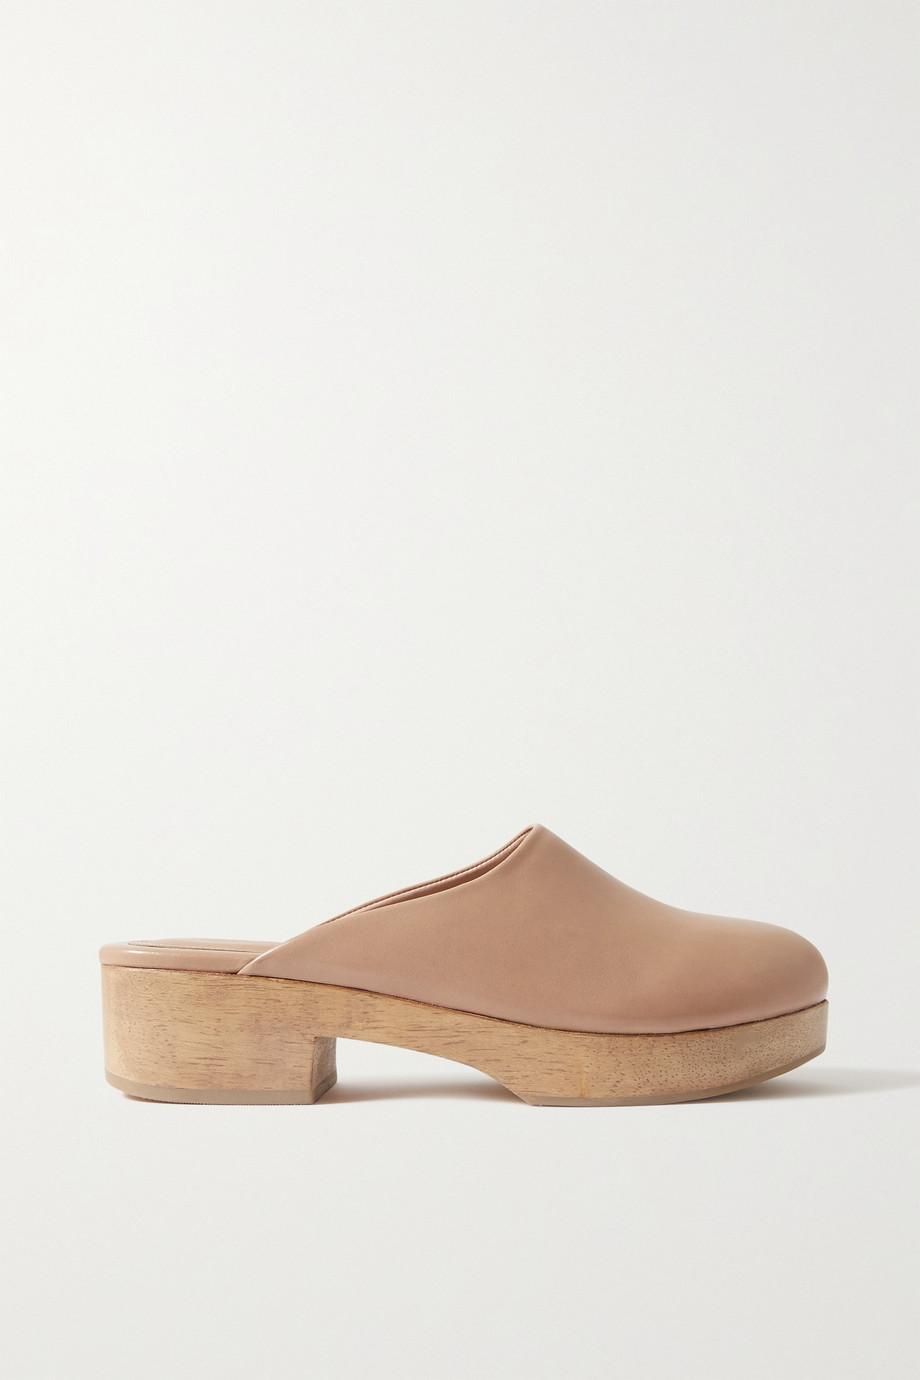 Porte & Paire + Frankie Shop glossed-leather platform clogs